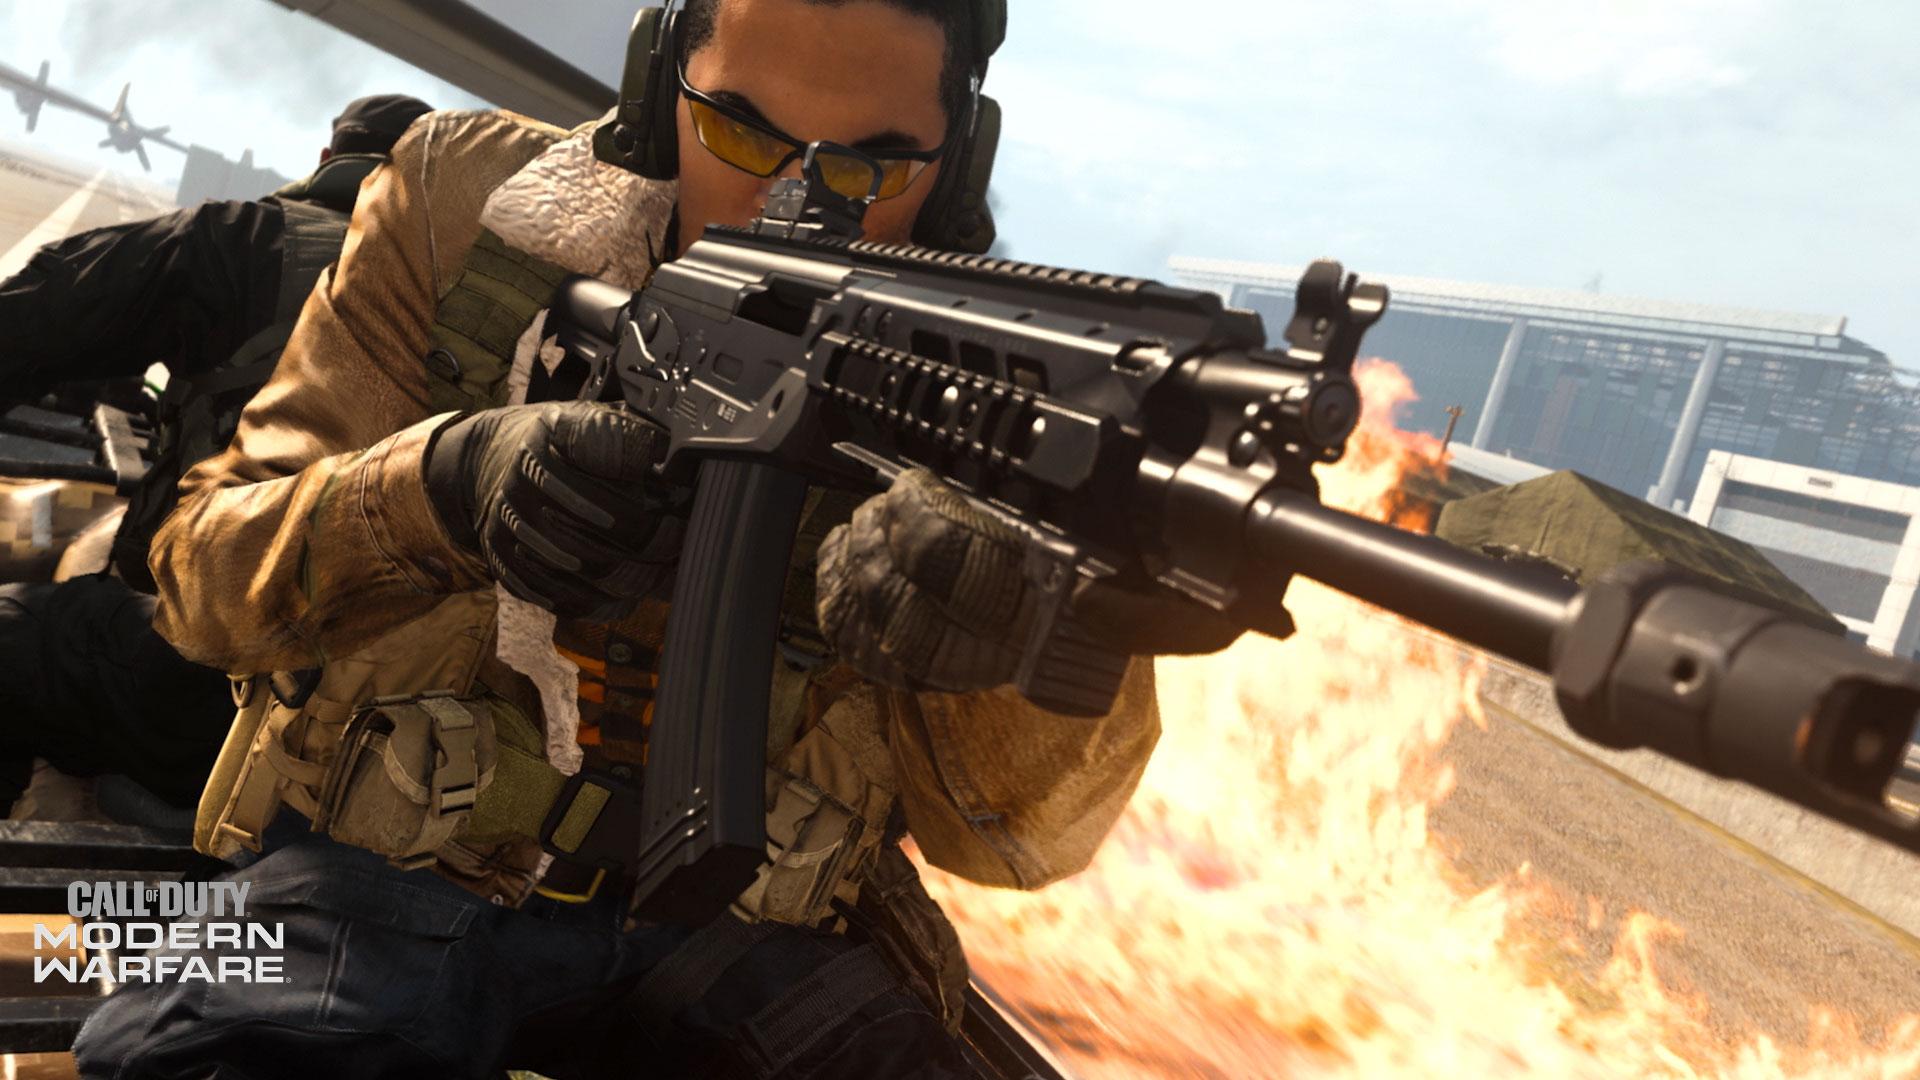 CR-56 AMAX being used in Modern Warfare